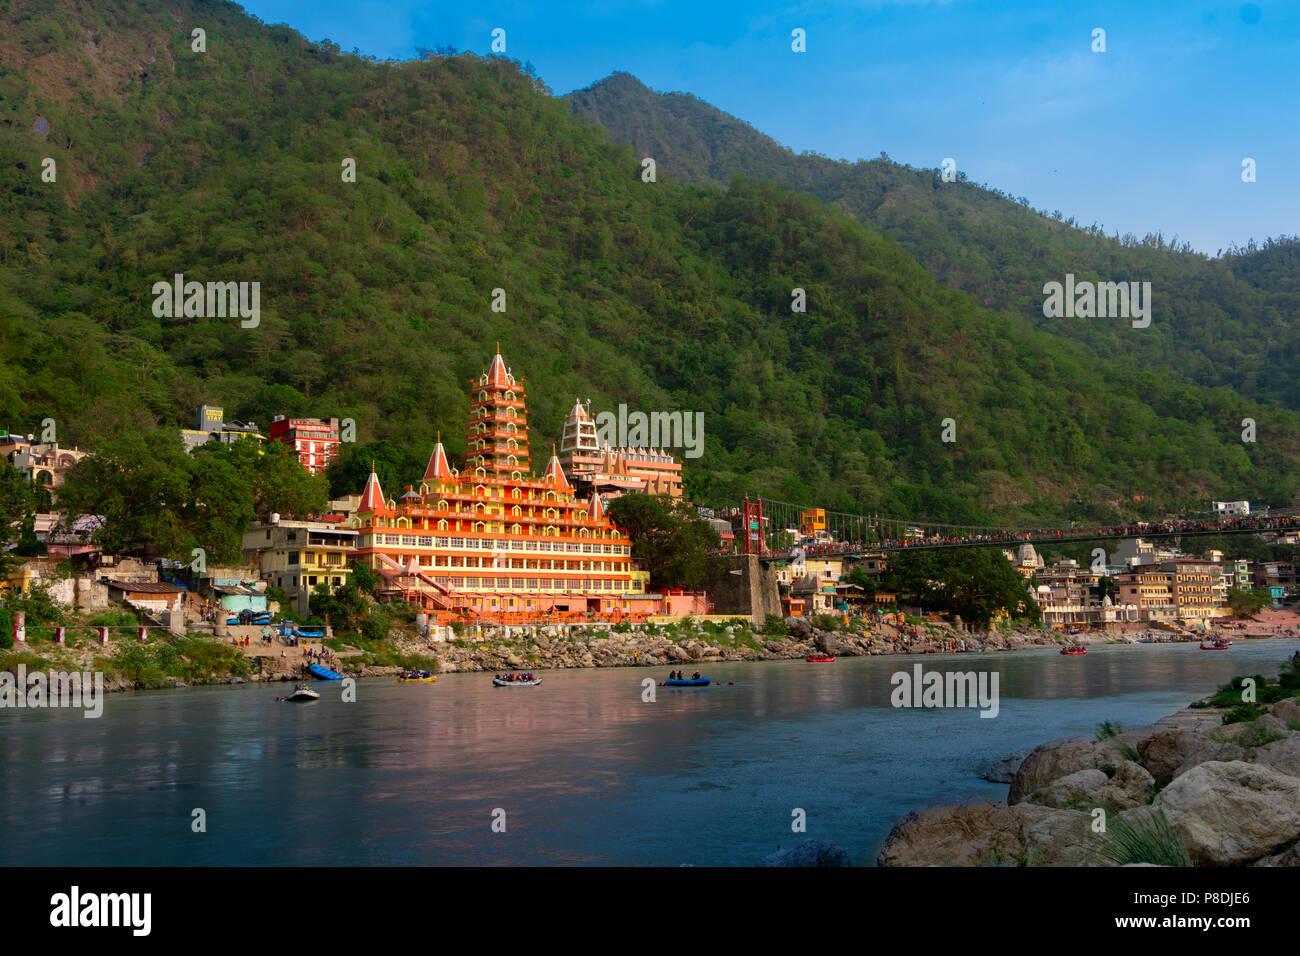 Vista del terraplén del río Ganga, Lakshman Jhula puente y templo, Trimbakeshwar Manzil Tera en Rishikesh Imagen De Stock